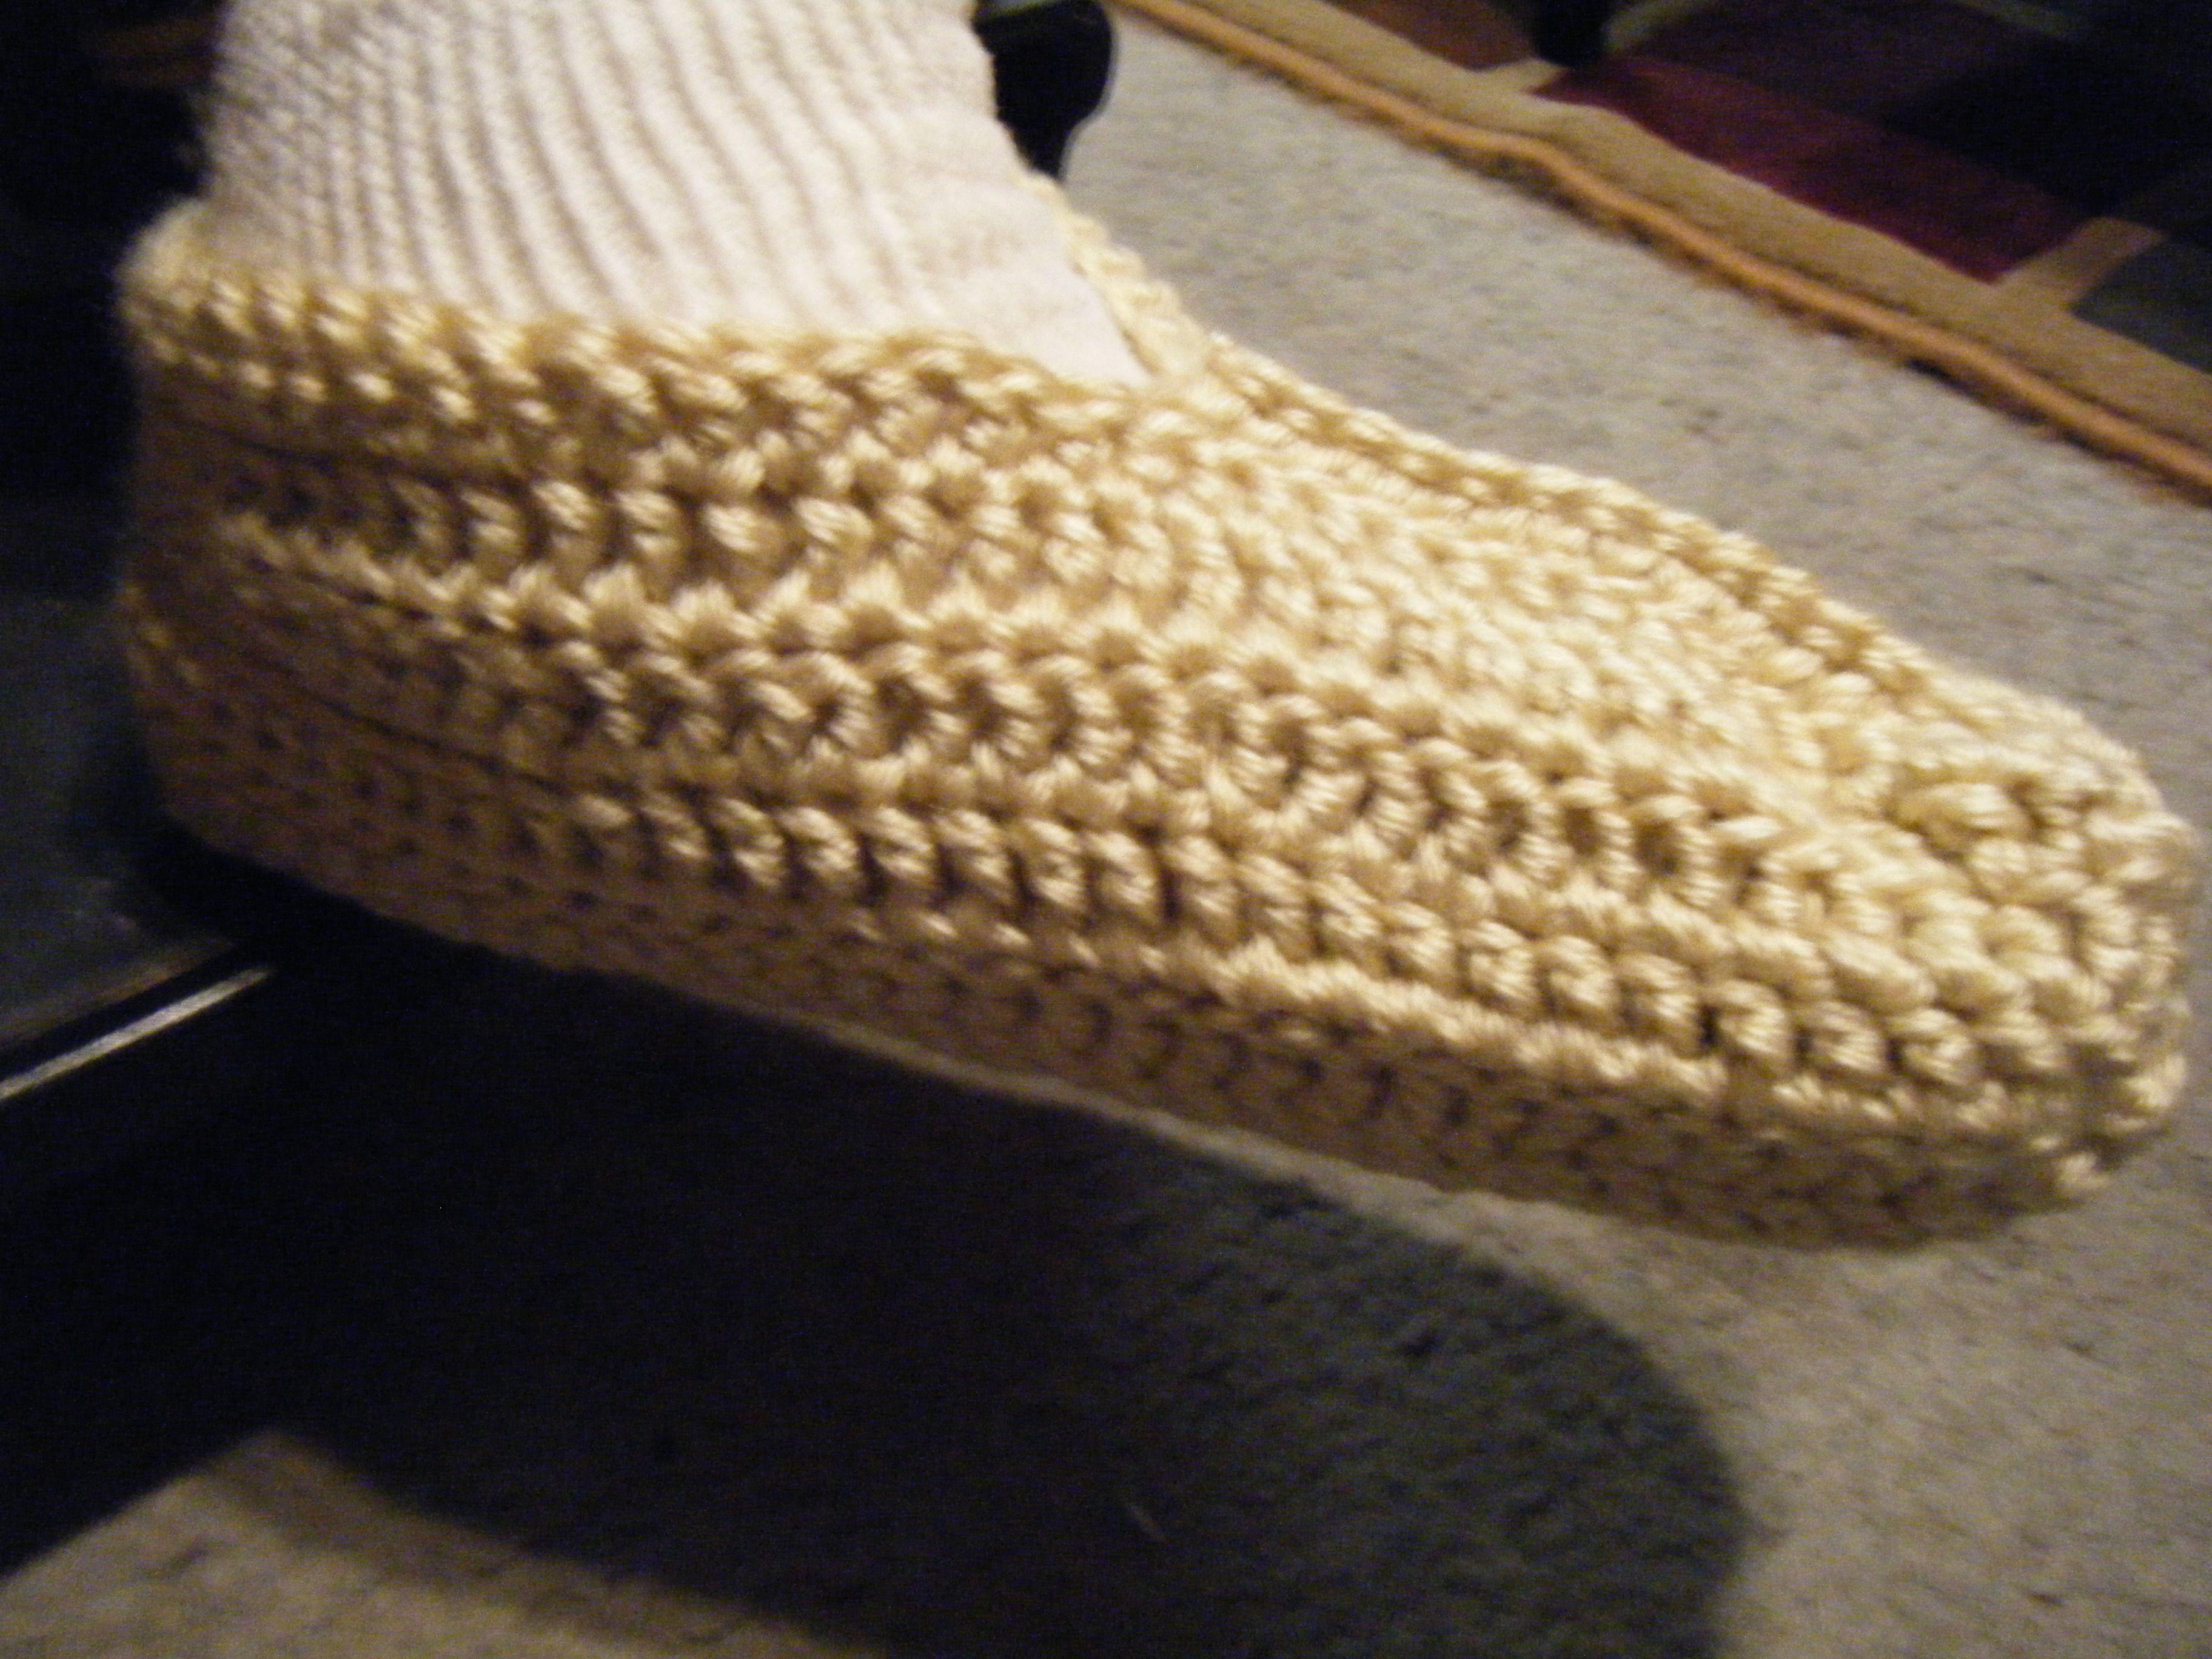 Crocheted single slipper pattern crochet easy crochet slippers crocheted single slipper pattern bankloansurffo Images